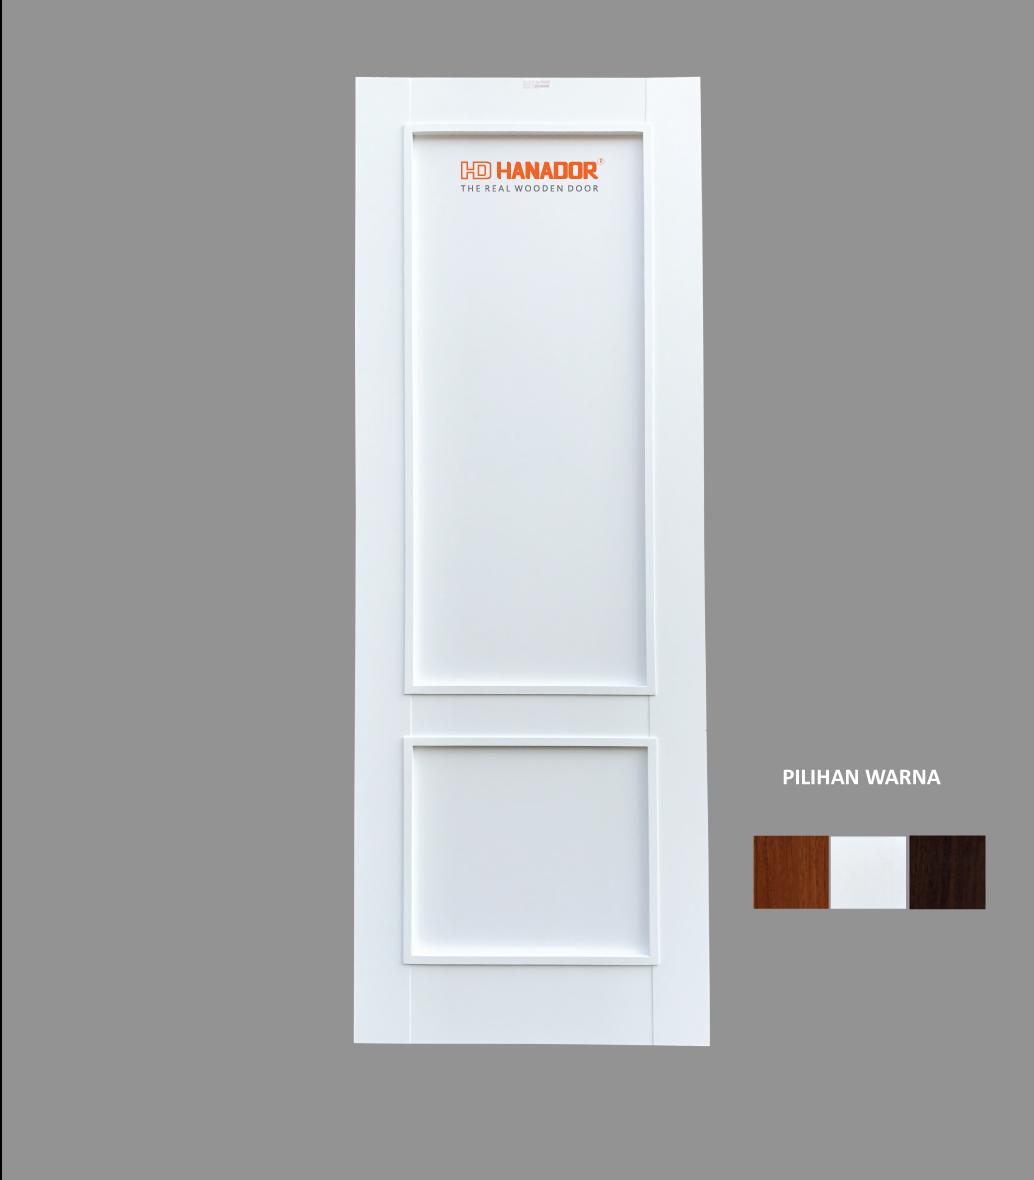 171002151406_premium-door-B8+color-sample_5.png